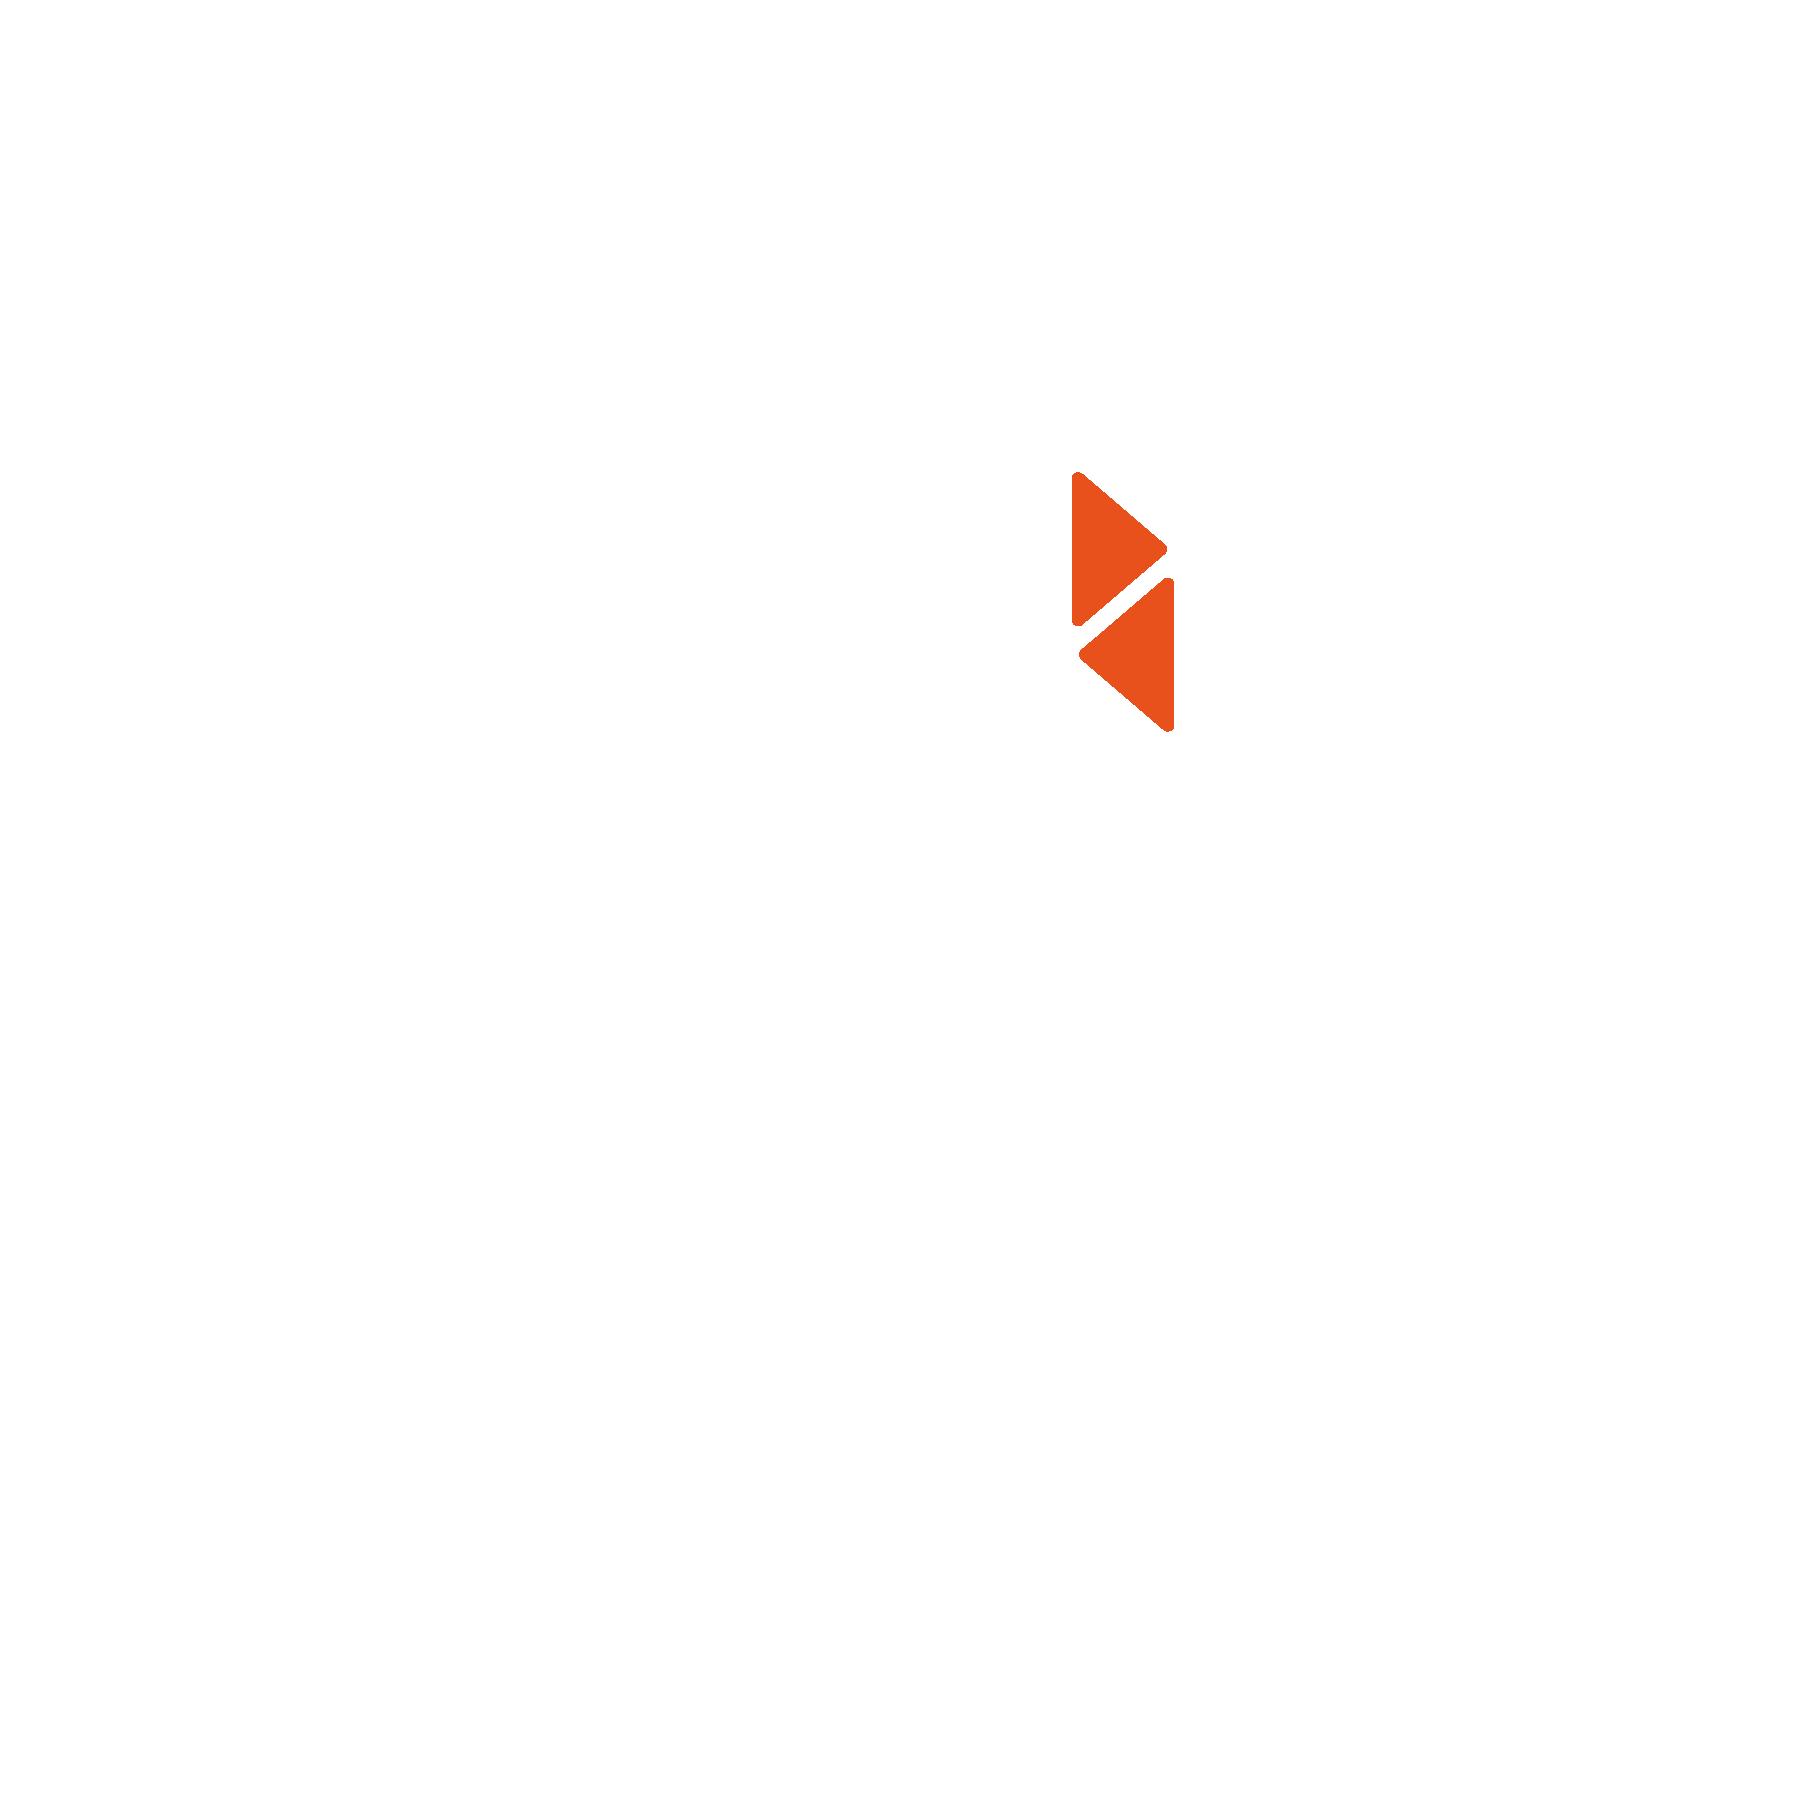 Caradonna traslochi